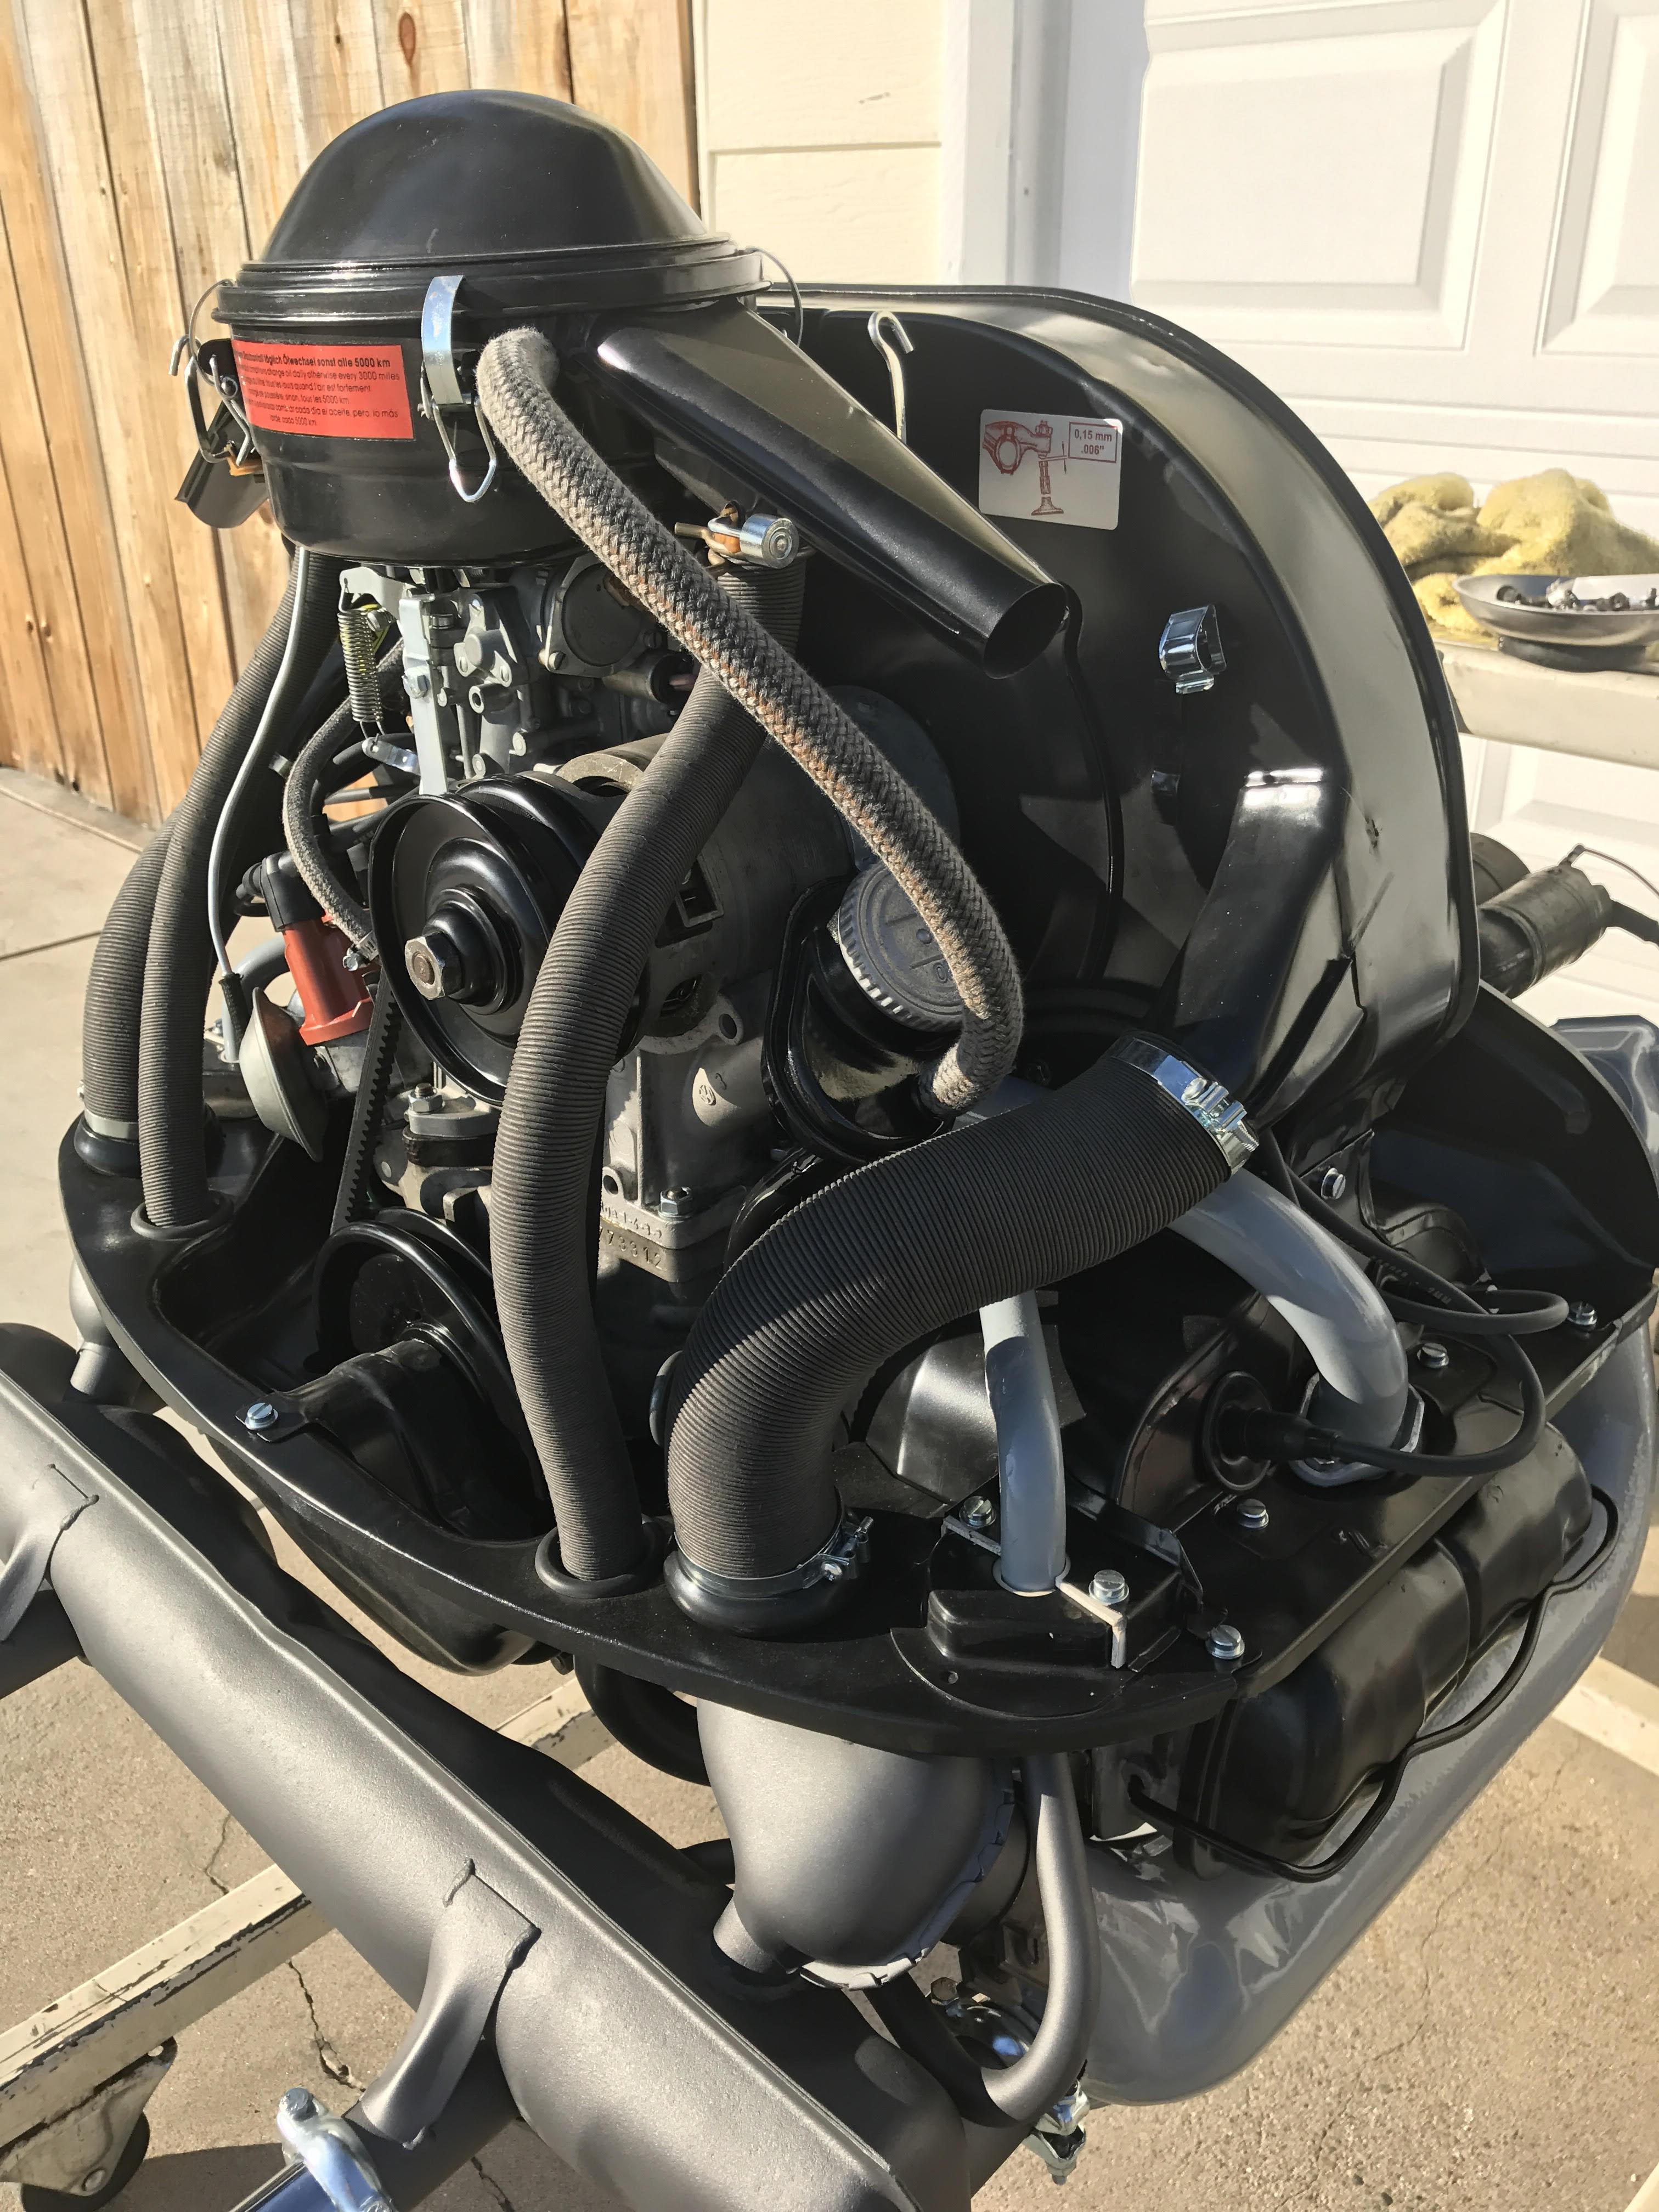 SOLD — '67 Beetle Engine - 1967 VW Beetle